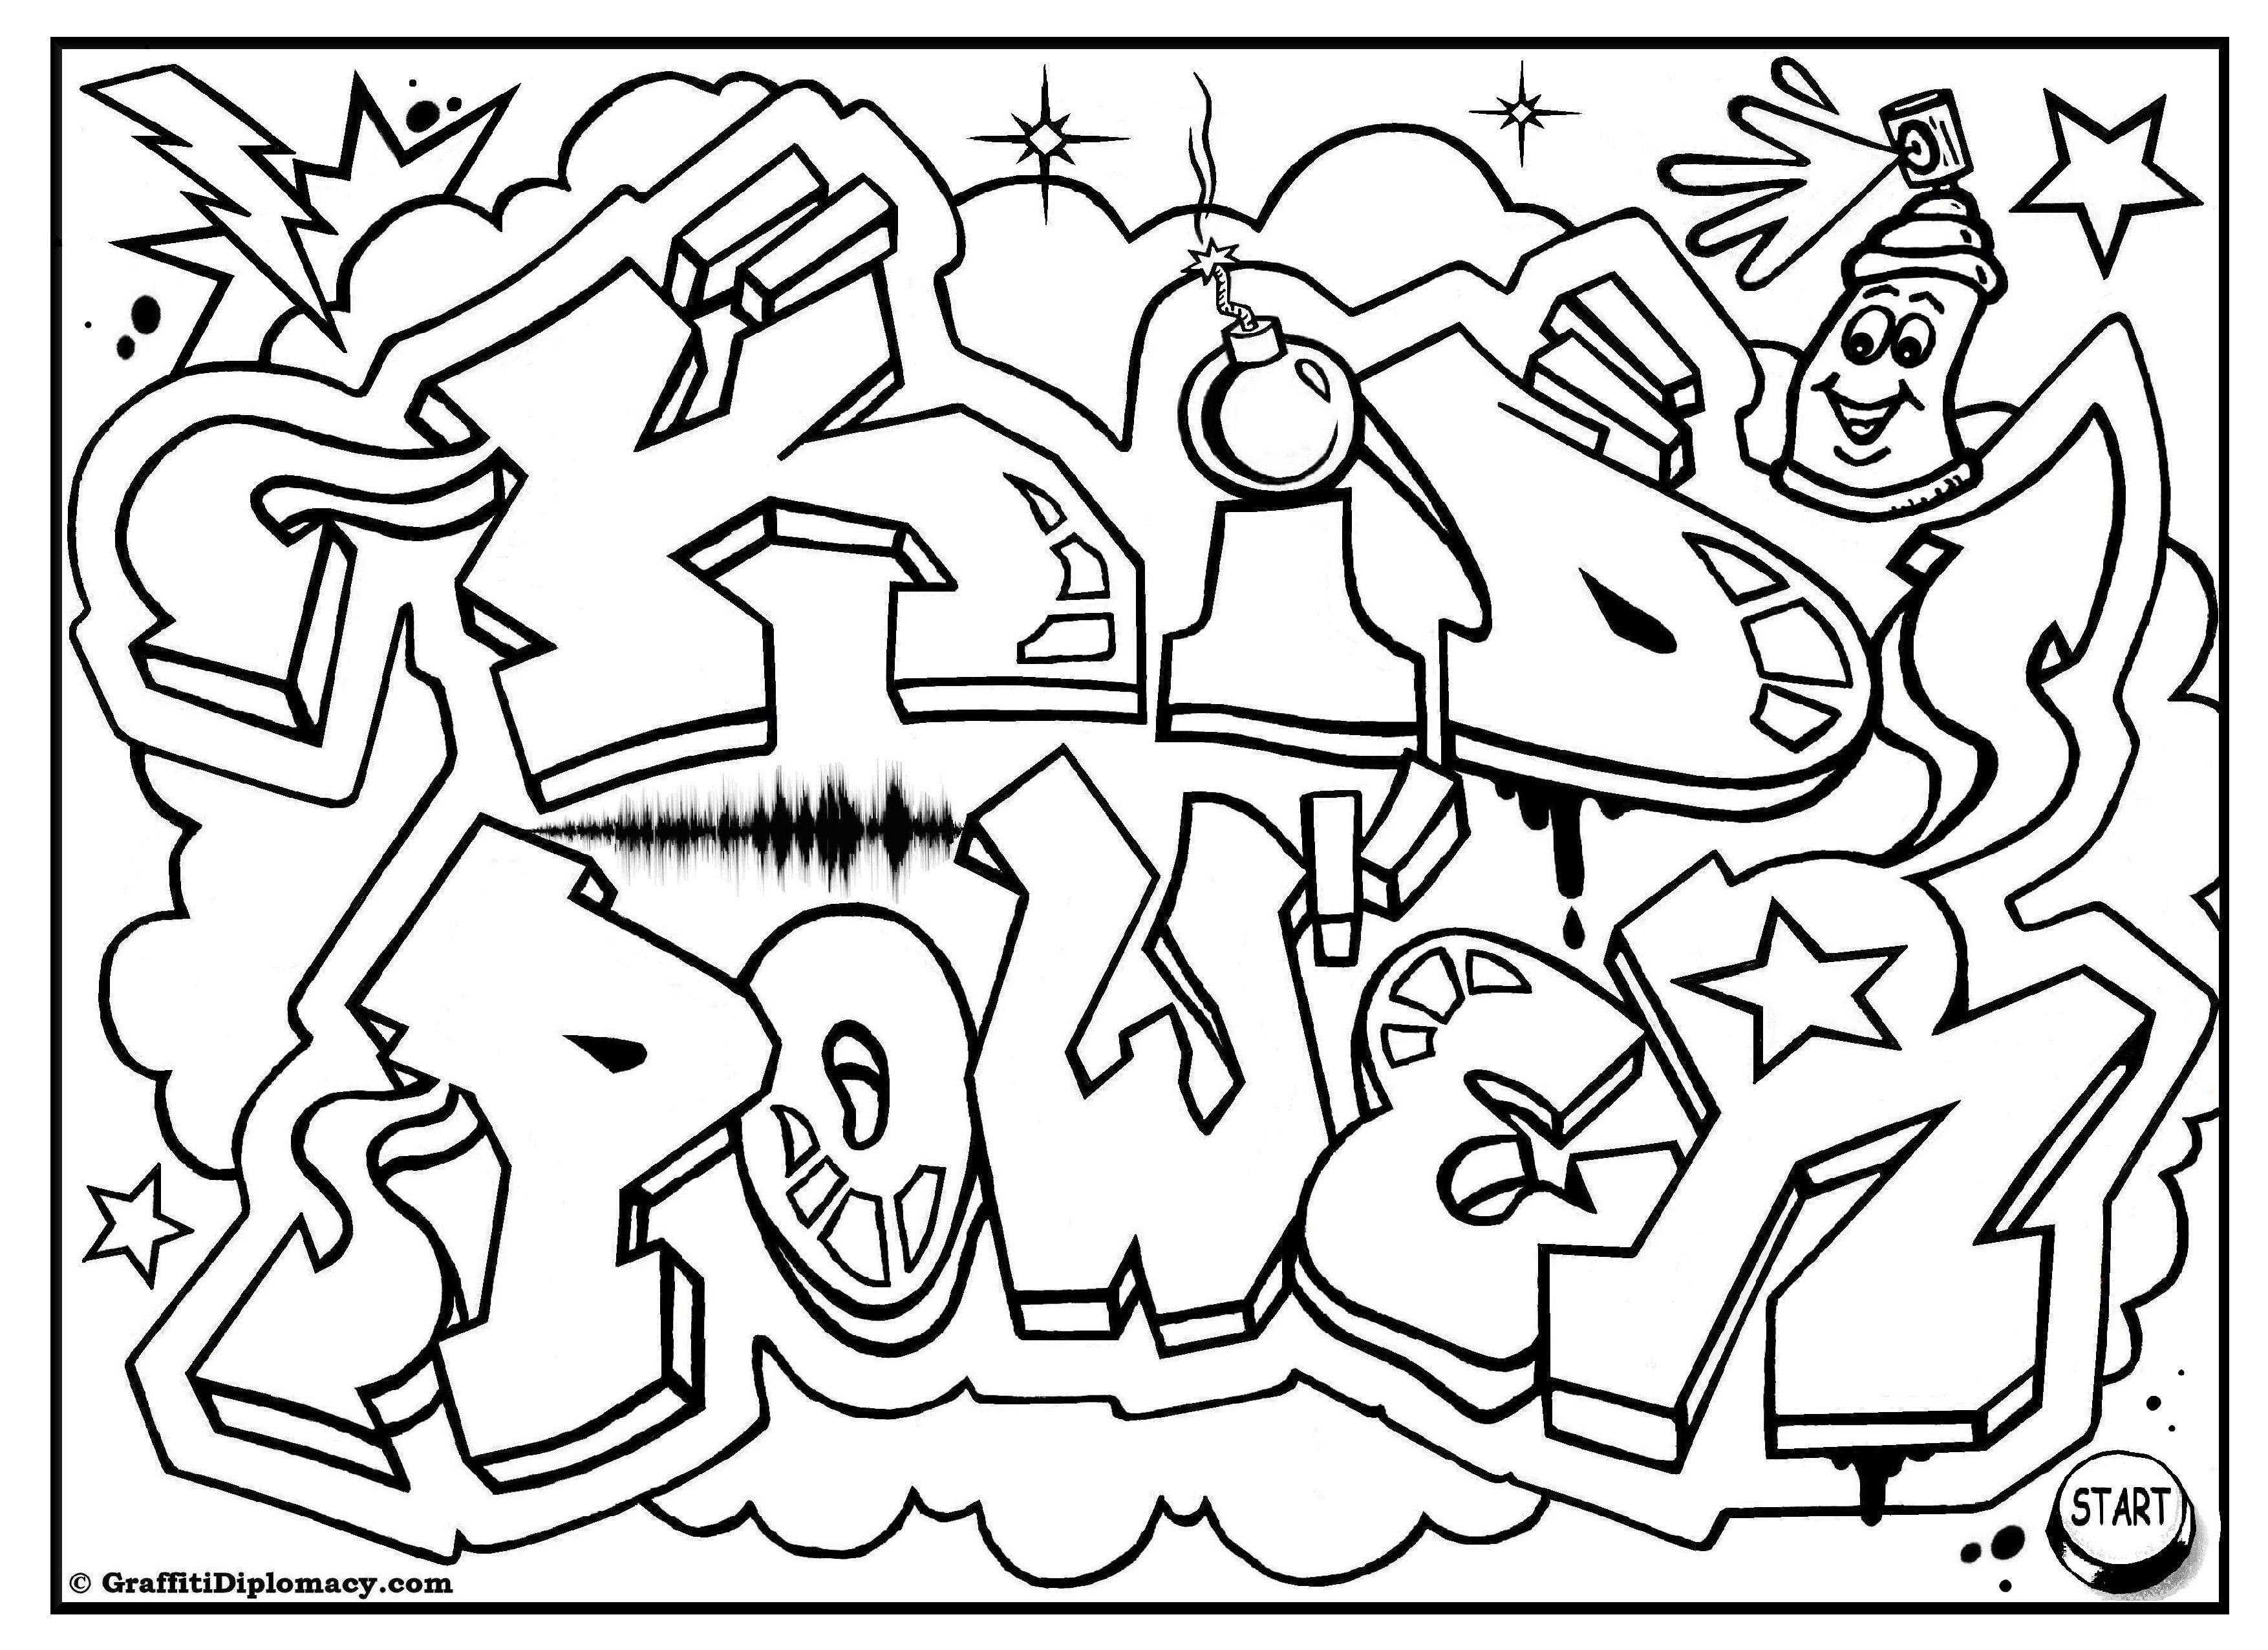 KID POWER free graffiti coloring page, free printable